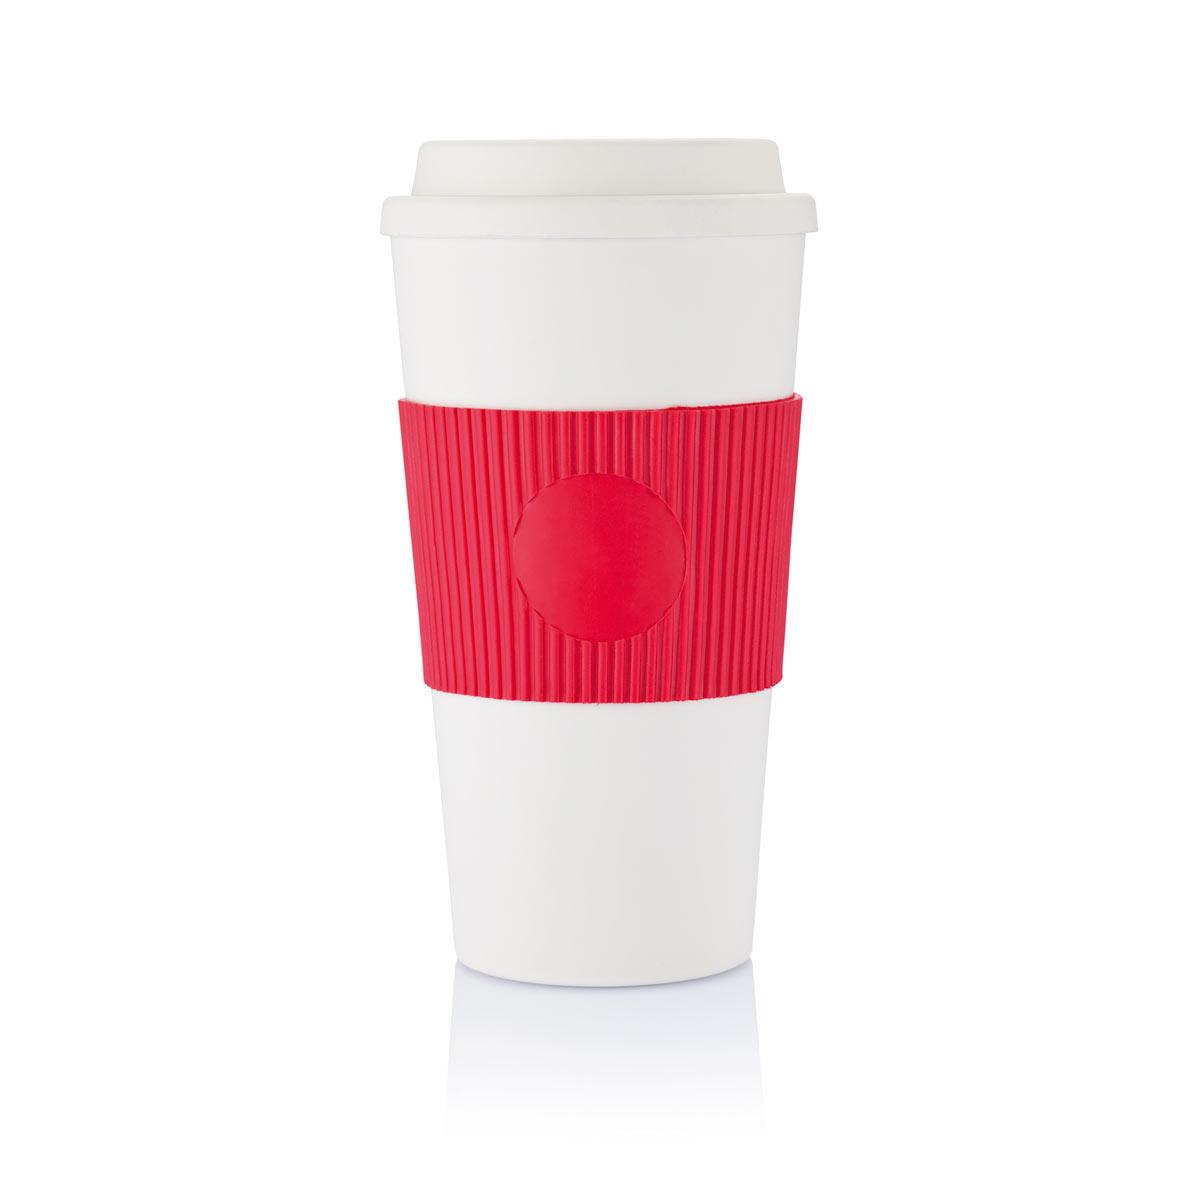 mug isotherme design mug inox bouteille publicitaire mug inox. Black Bedroom Furniture Sets. Home Design Ideas